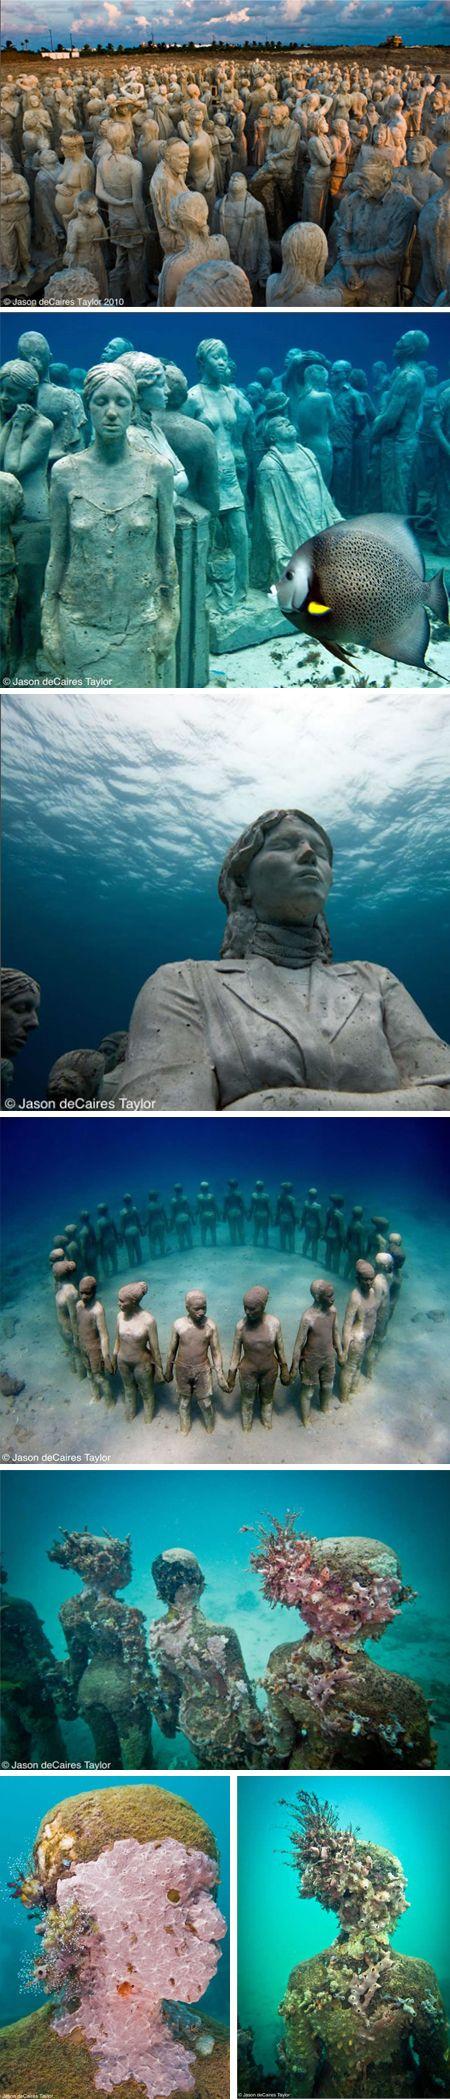 Underwater museum, Cancun. Mexico.